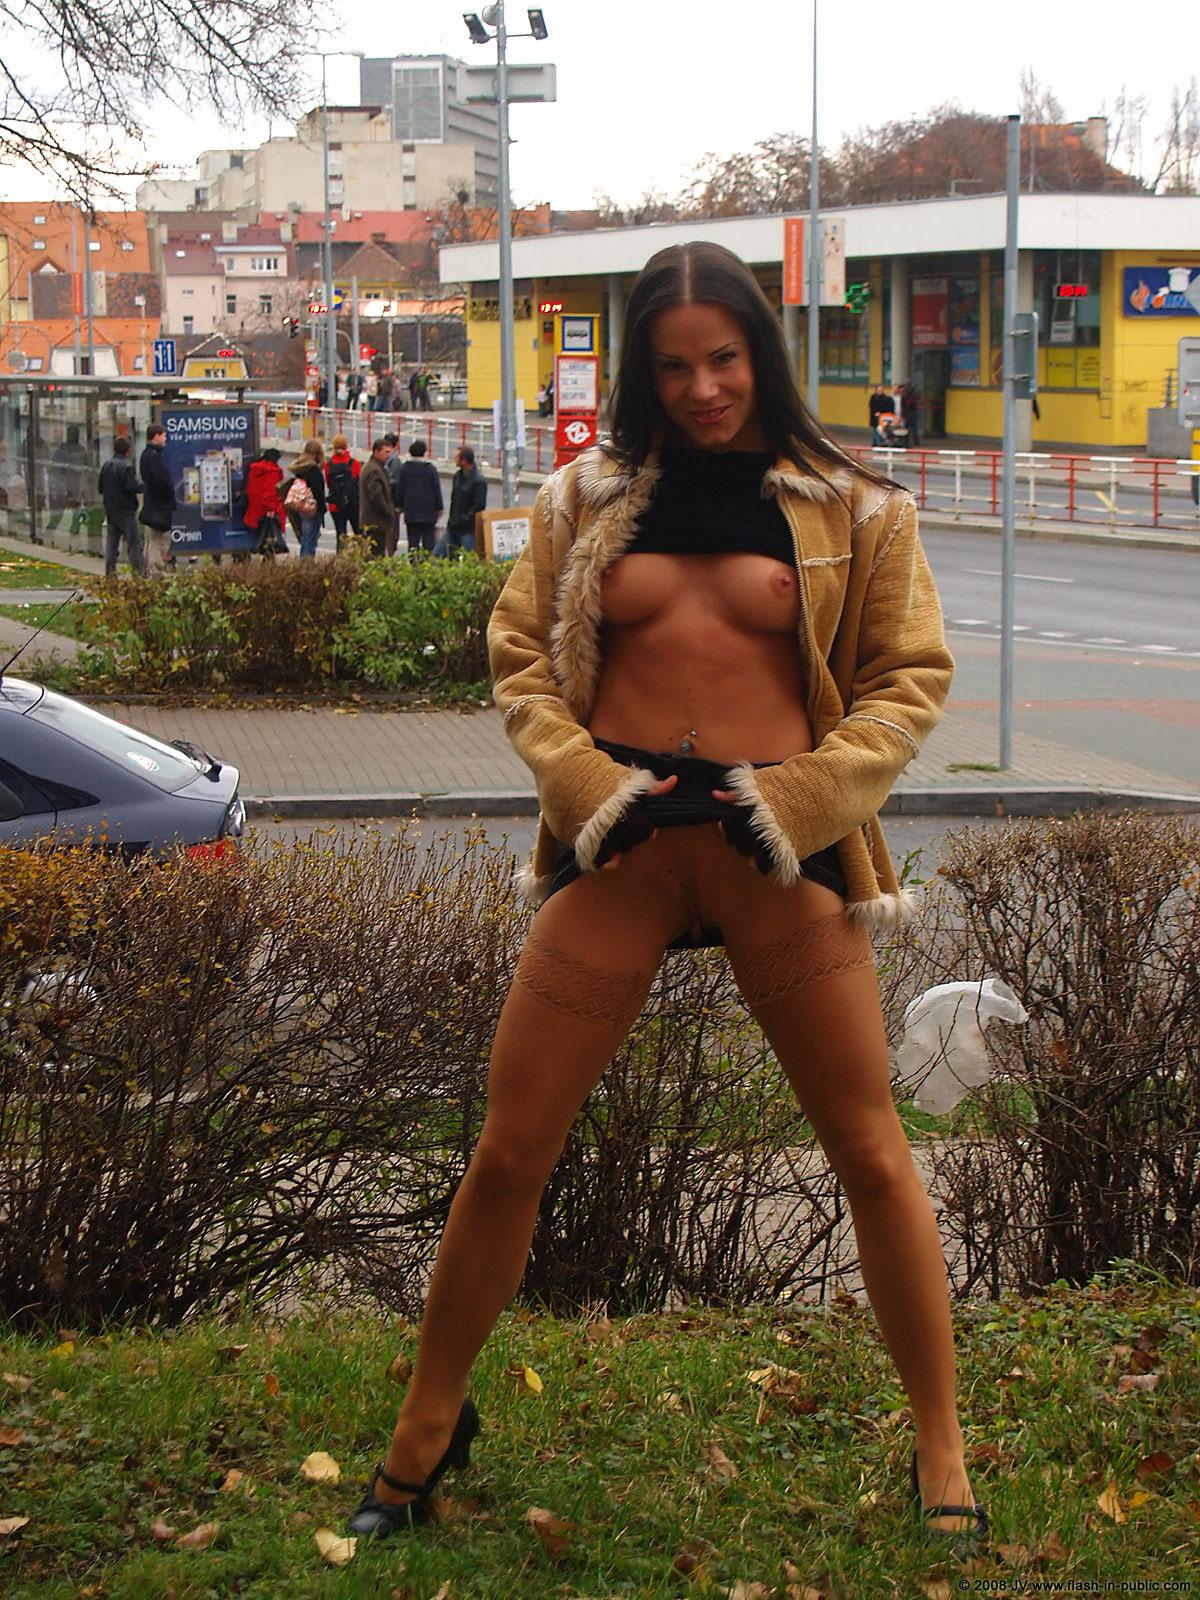 alexandra-g-bottomless-stockings-flash-in-public-25